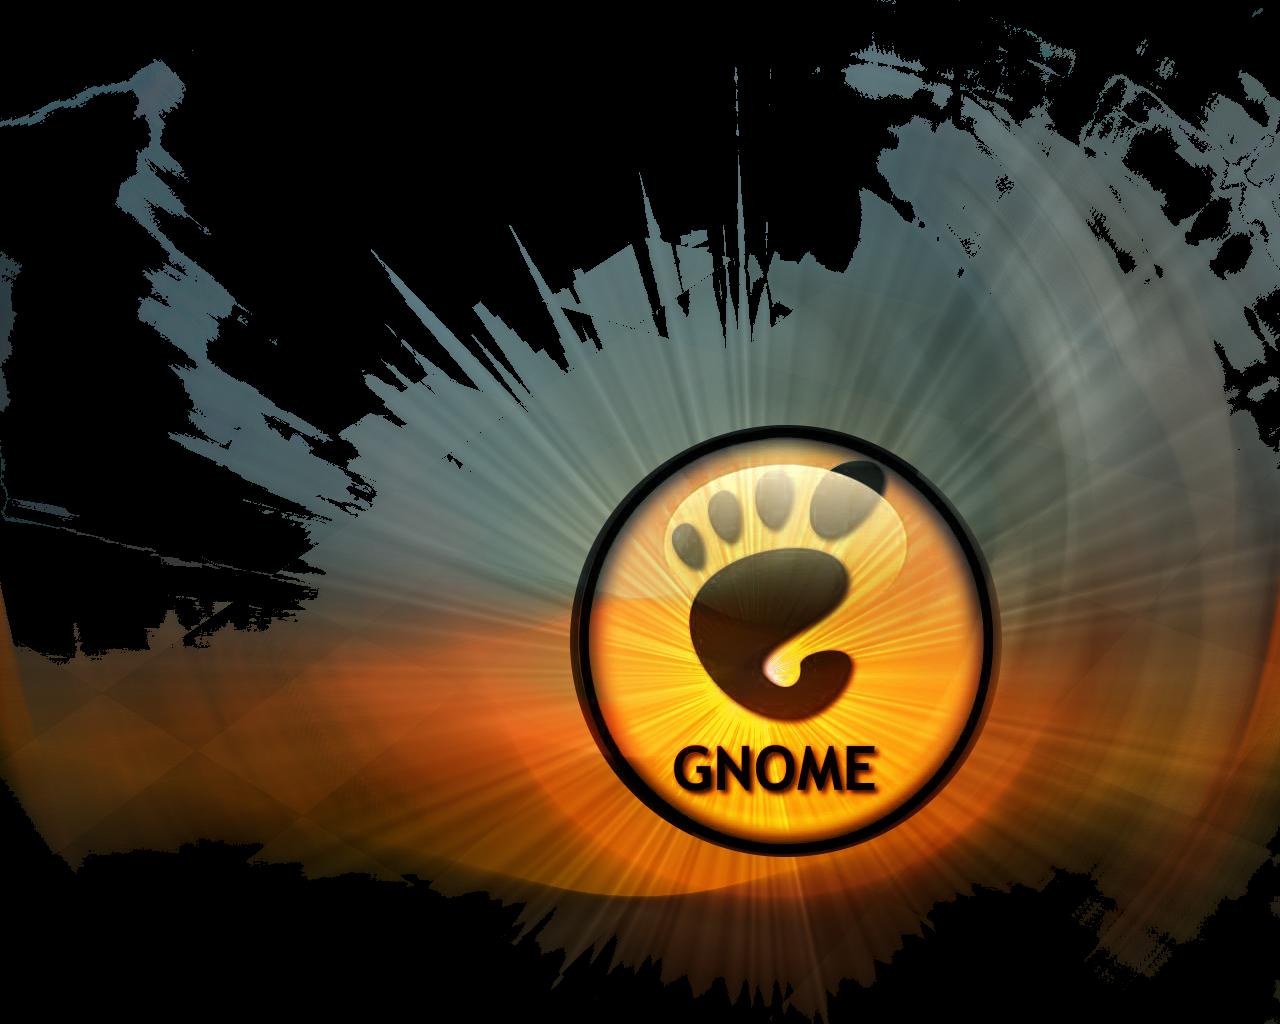 http://3.bp.blogspot.com/-uLBsMQCGiB0/TxFWoboVgvI/AAAAAAAAAcs/7Sm_4WKJPHE/s1600/GNOME-Plosion2.png